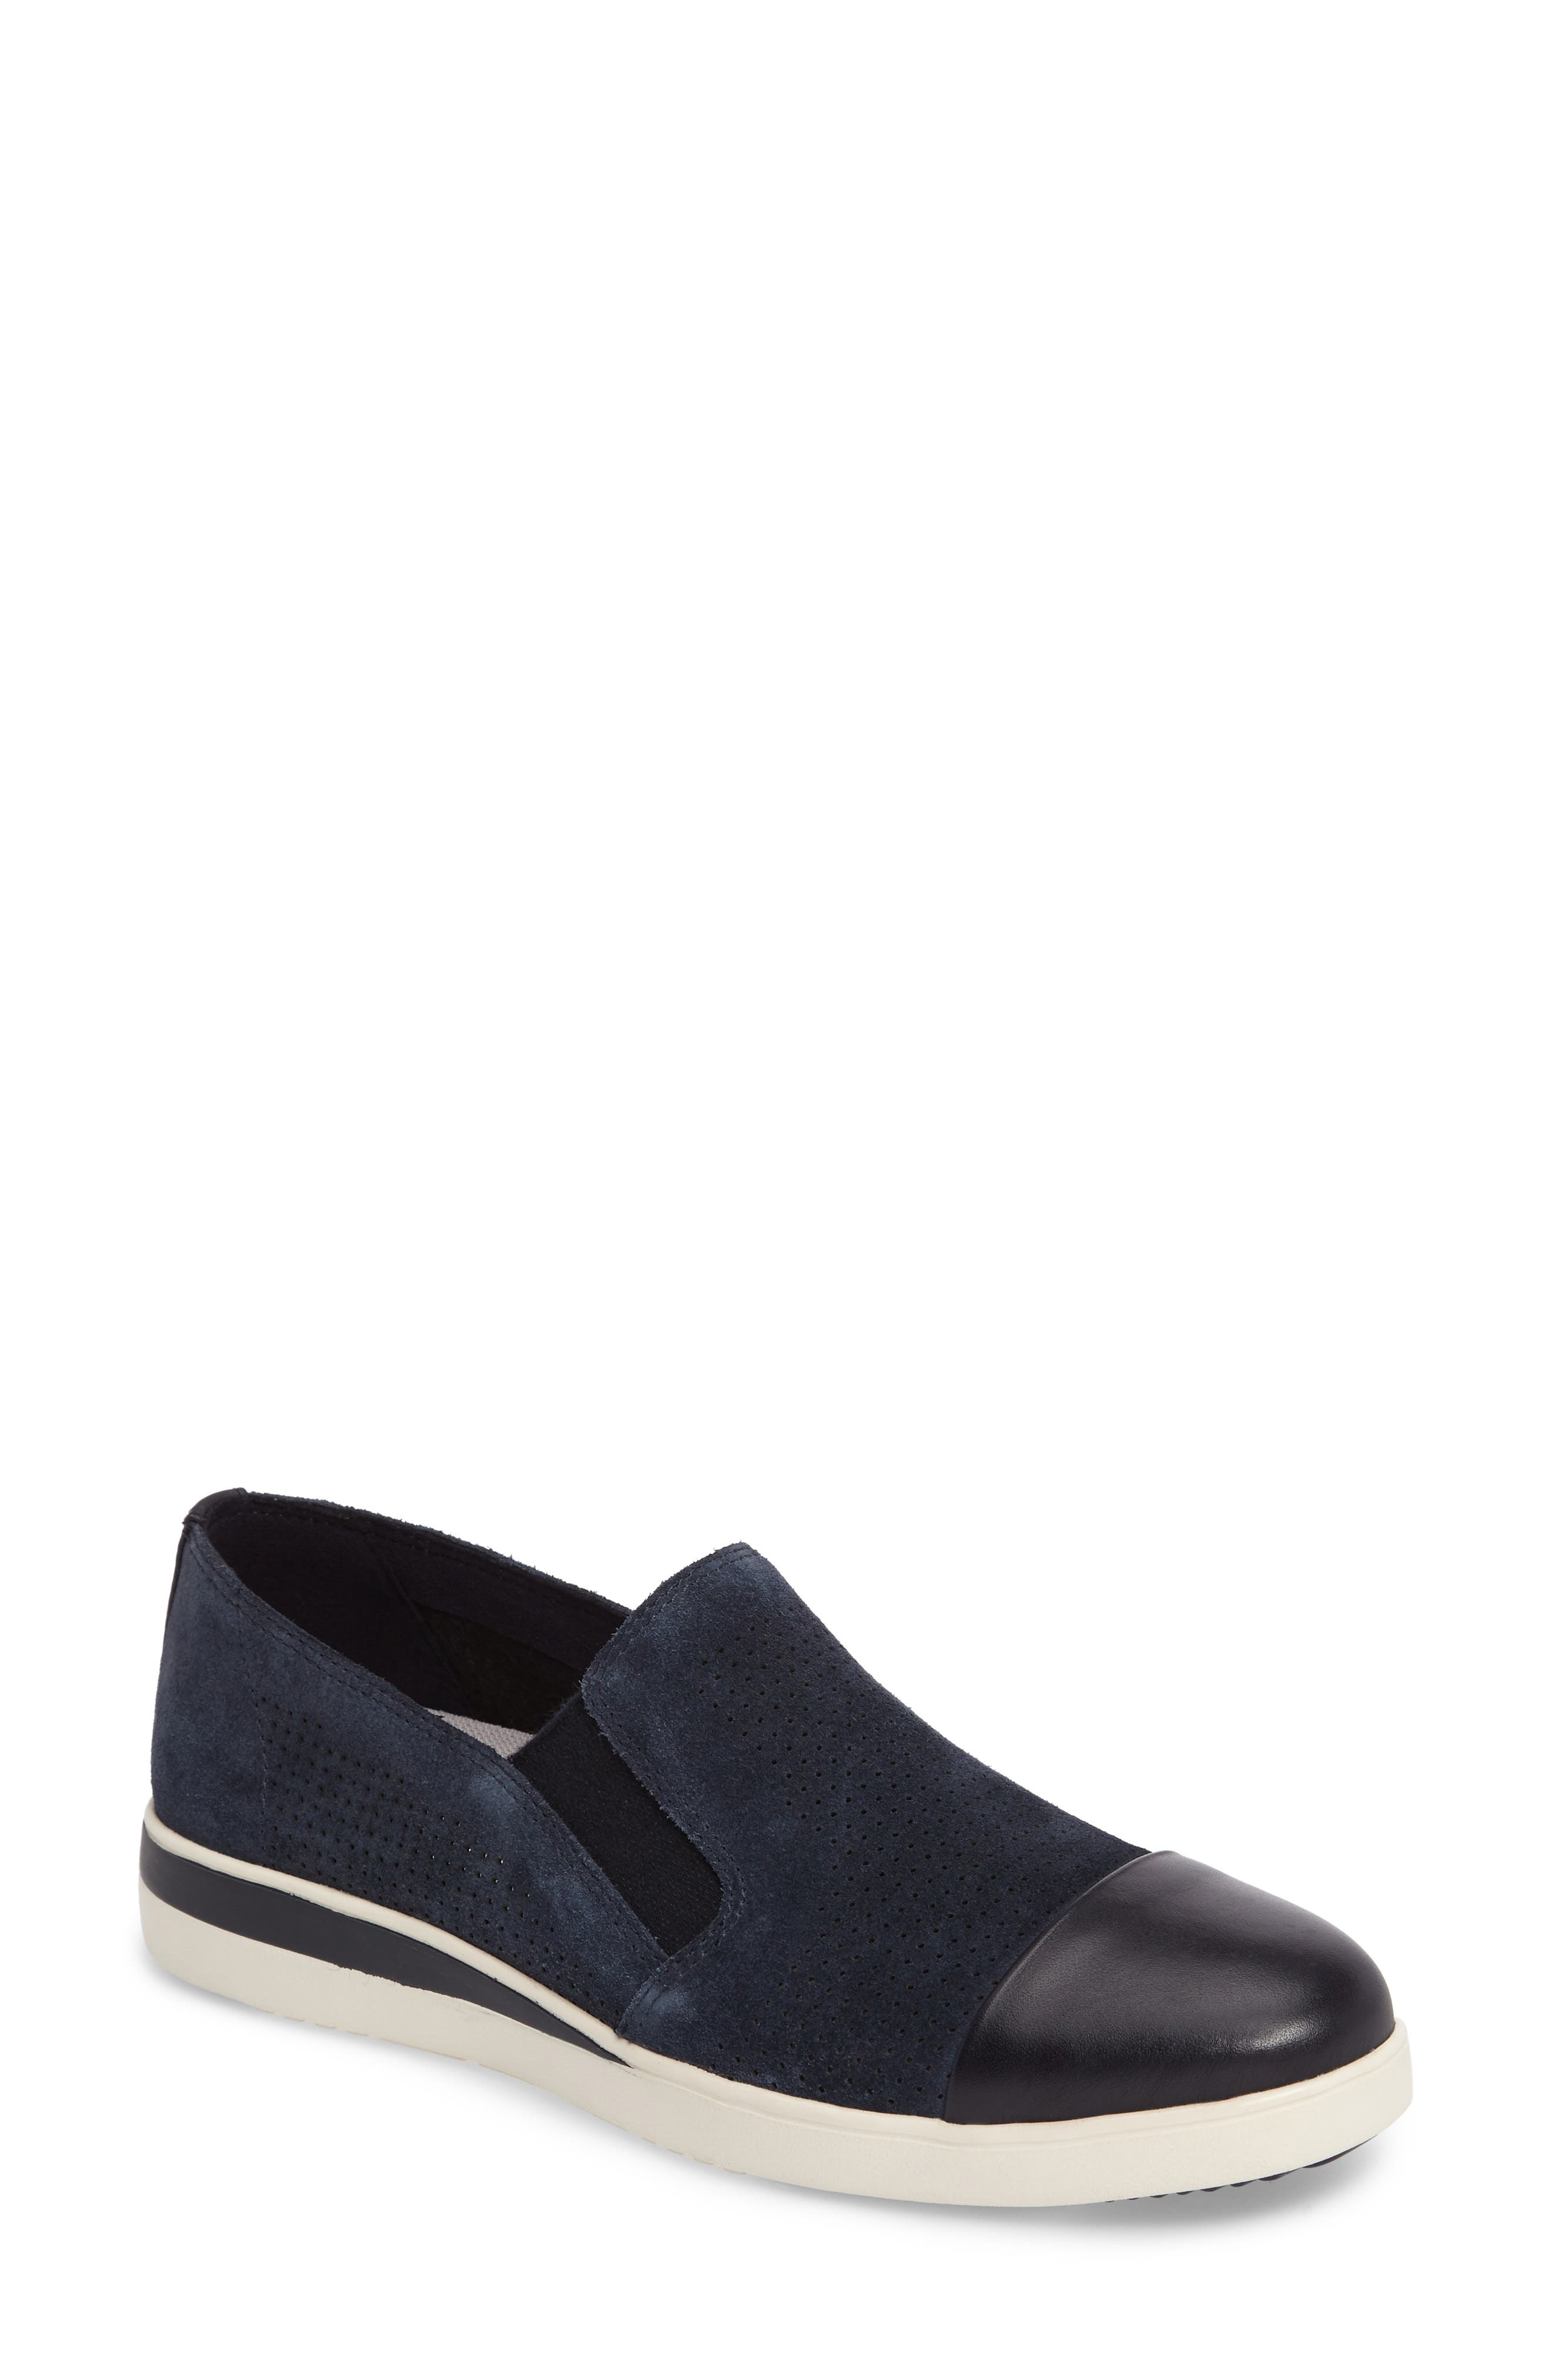 Aviana Cap Toe Slip-On Sneaker,                             Main thumbnail 1, color,                             Lagoon Suede